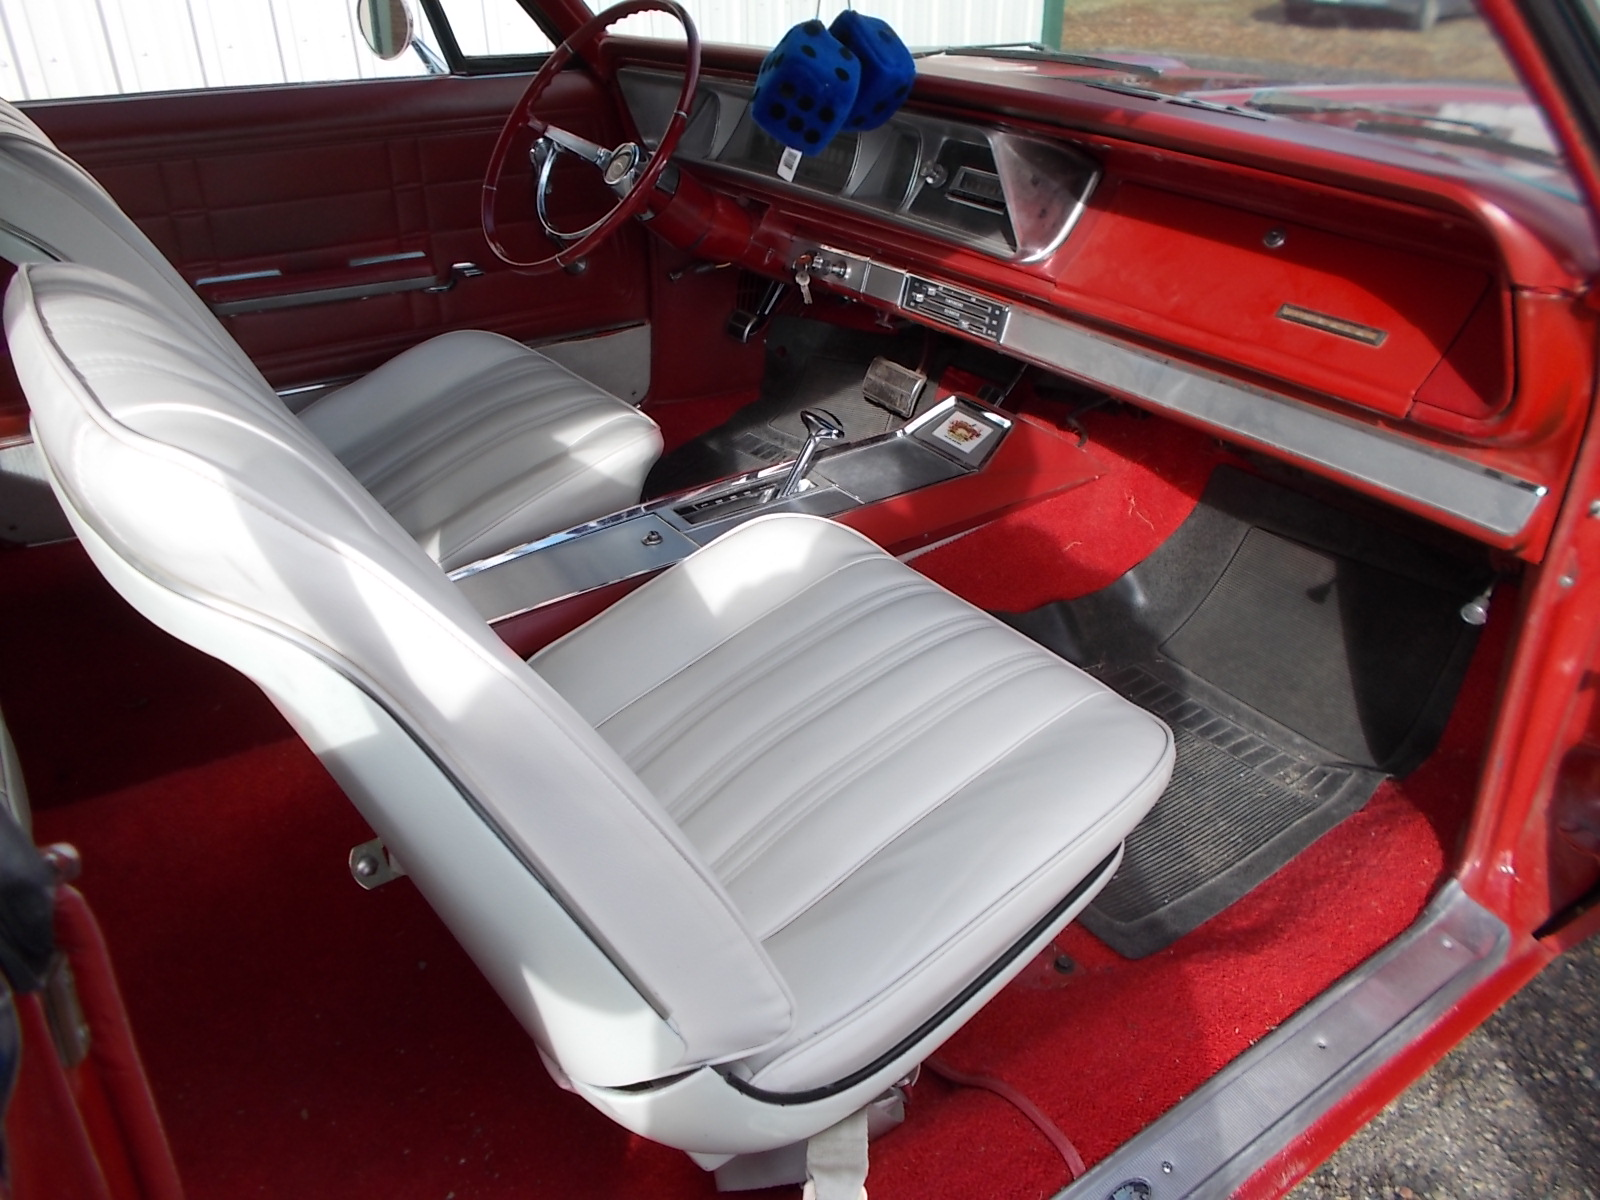 1966 Chevrolet Impala Ss Convertible Greater Dakota Classics Chevy